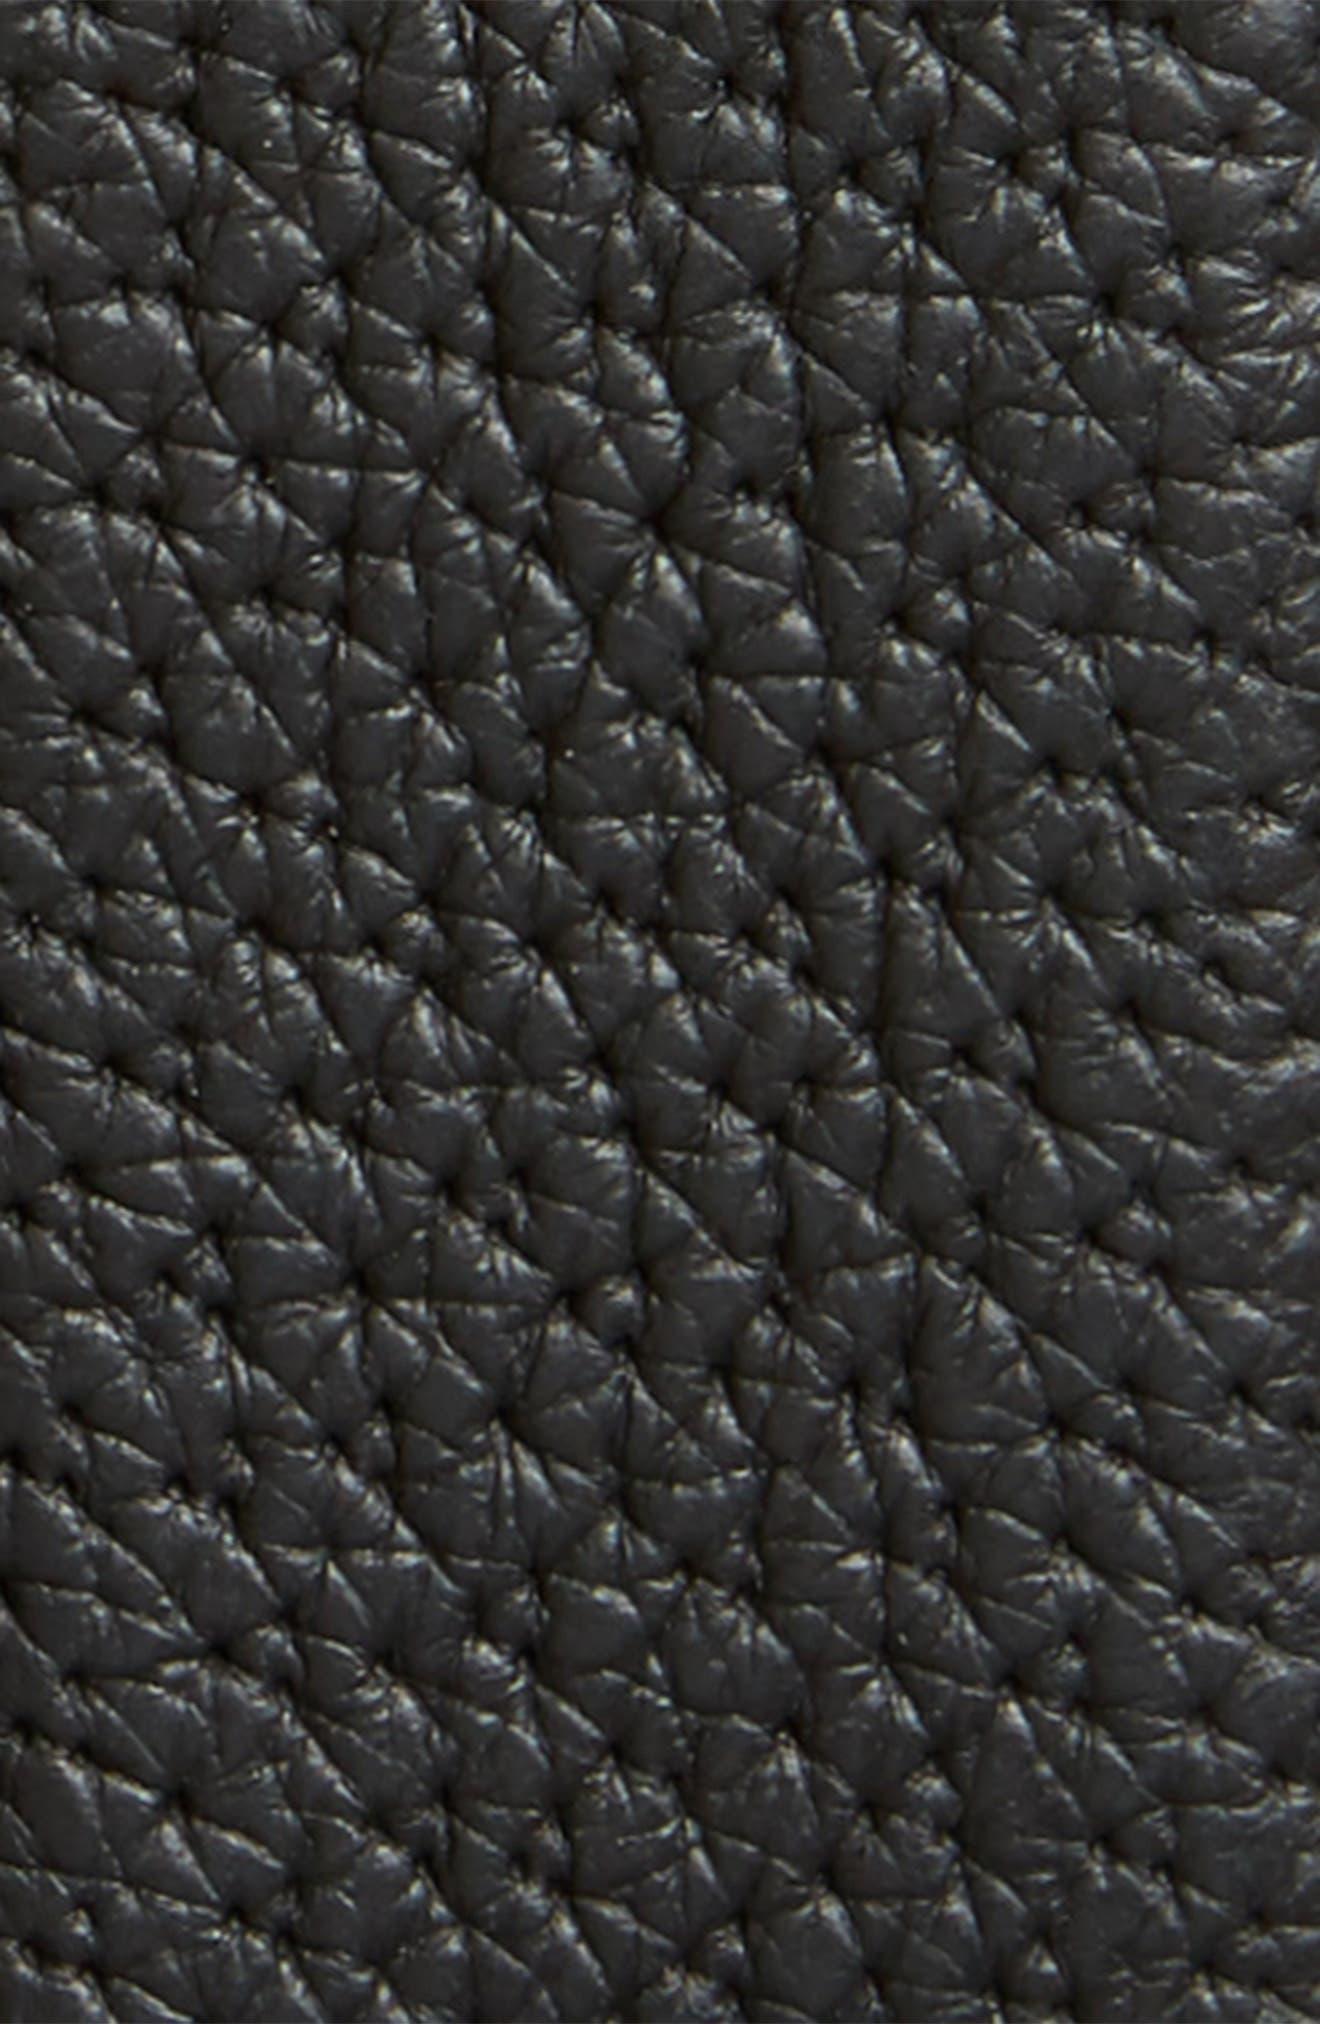 Medusa Head Leather Belt,                             Alternate thumbnail 2, color,                             001